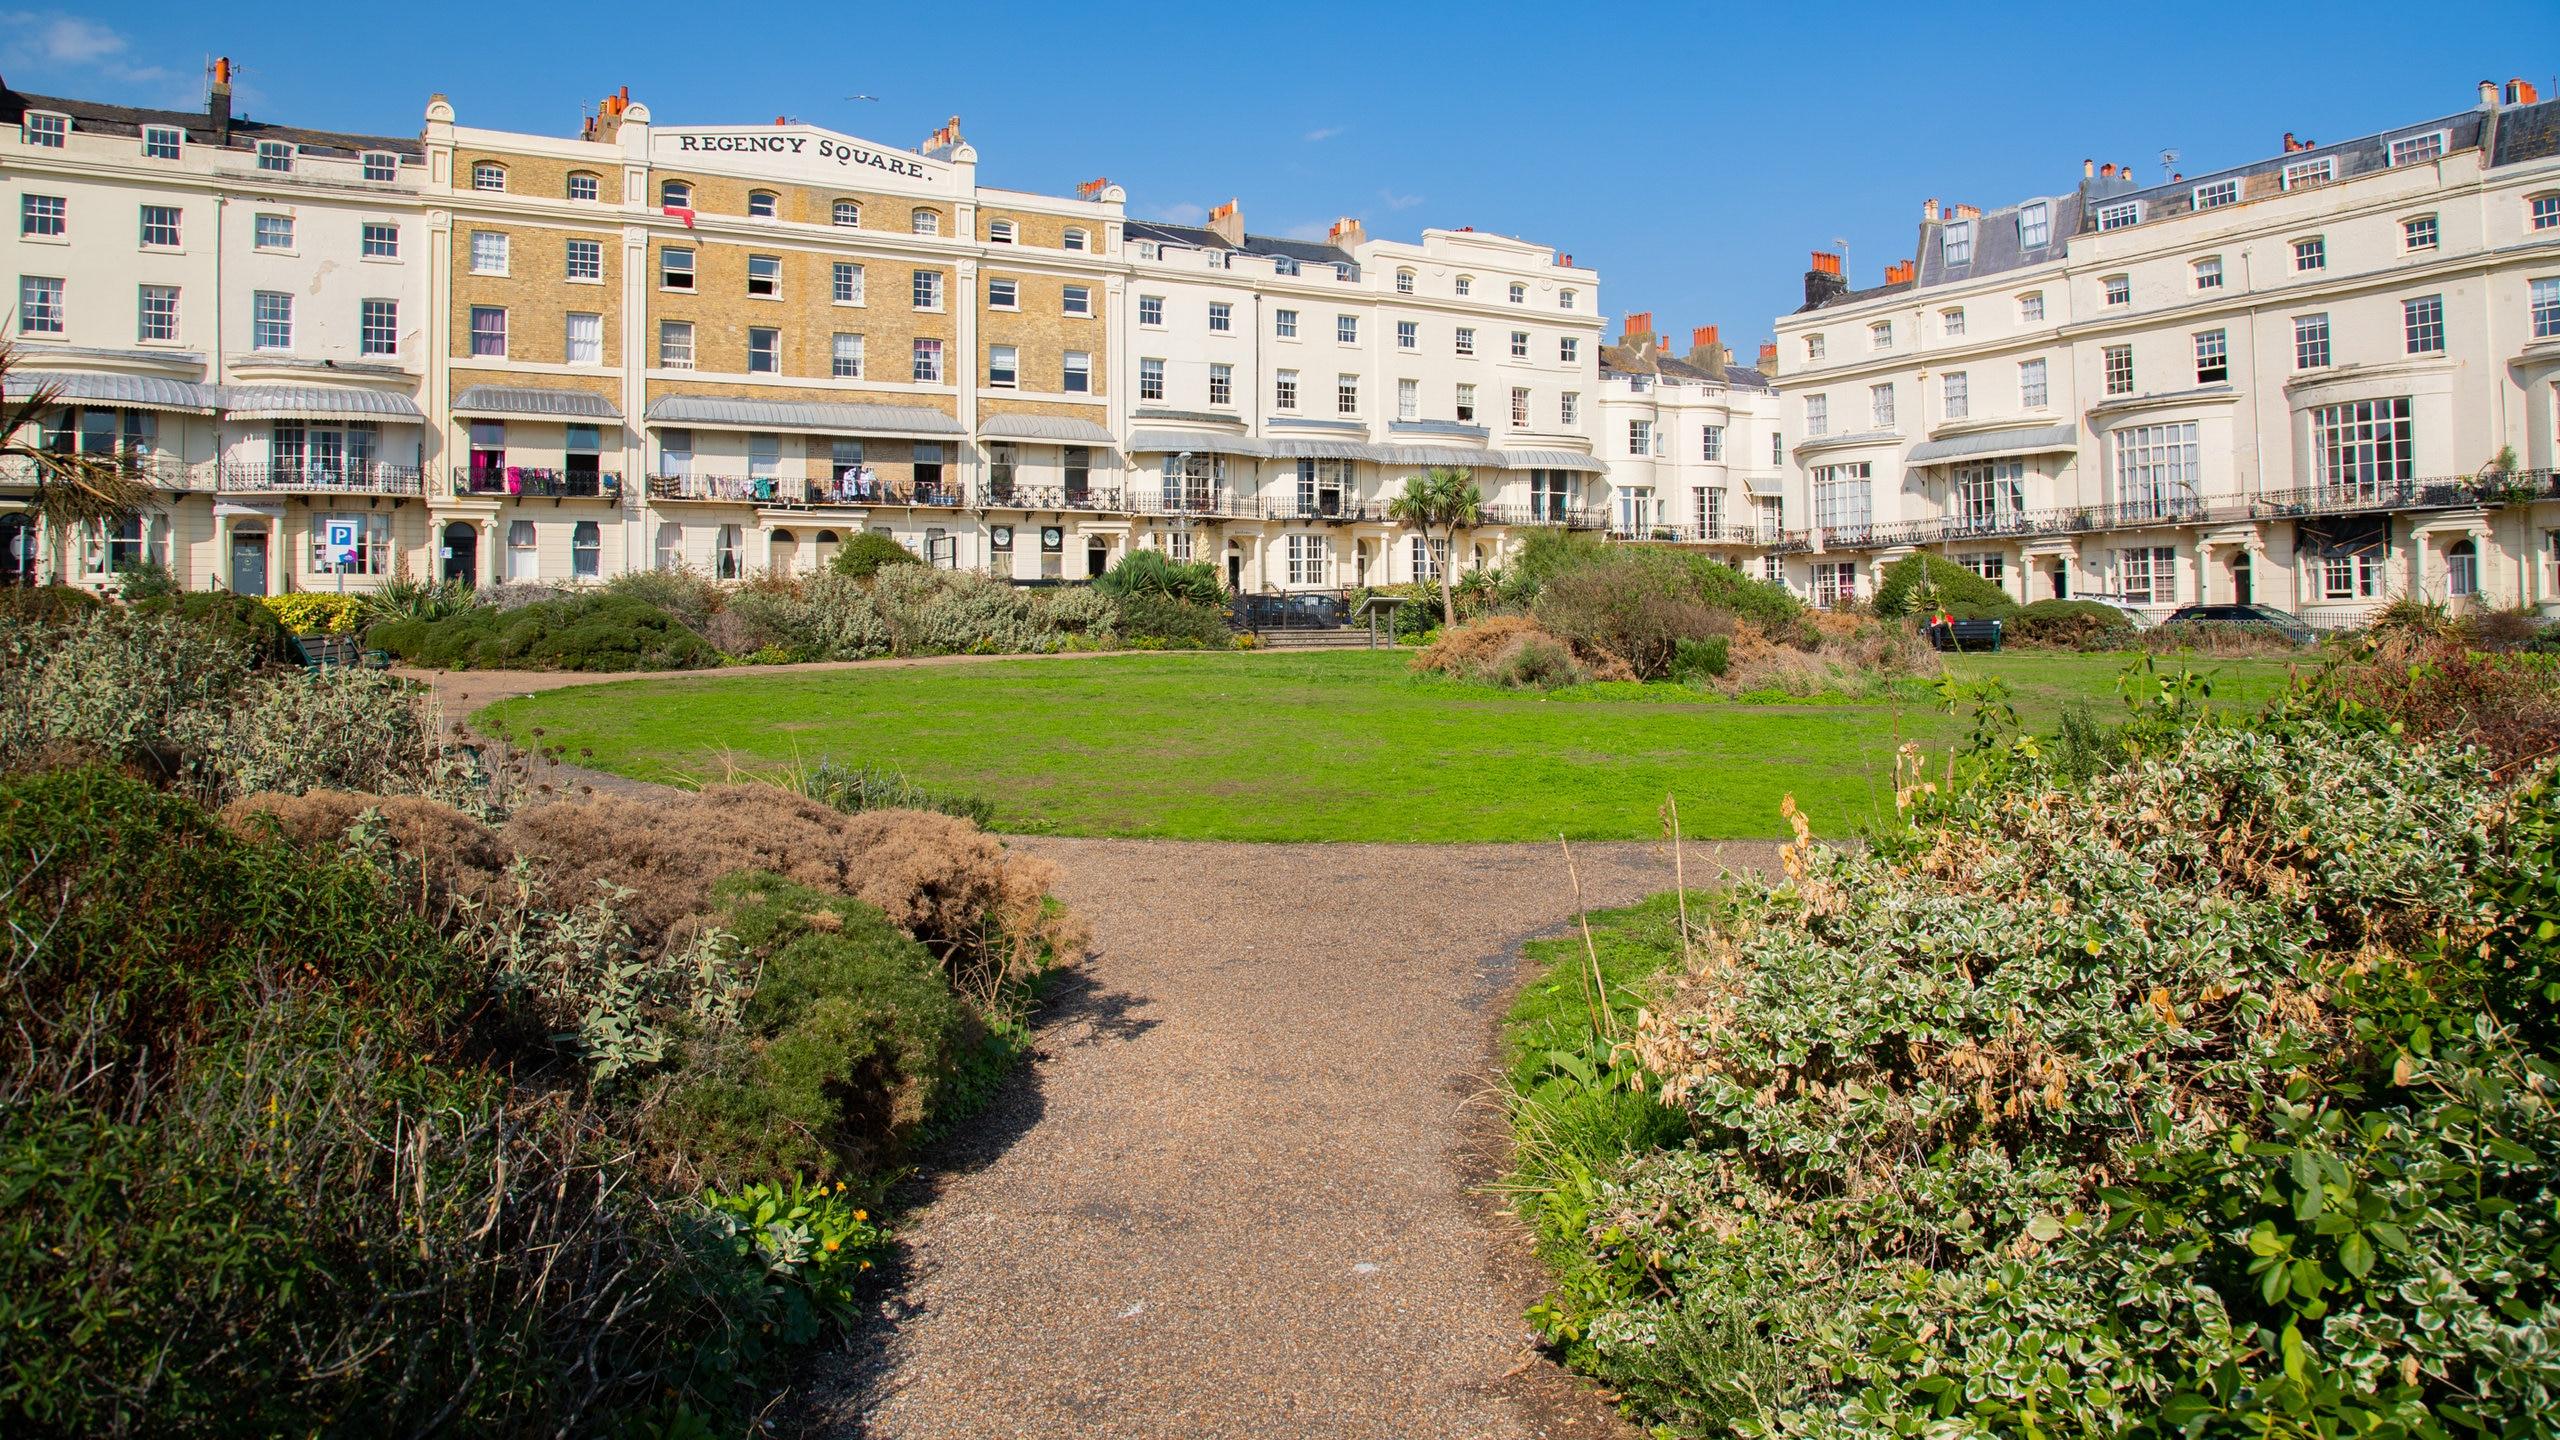 Regency Square, Brighton, England, United Kingdom